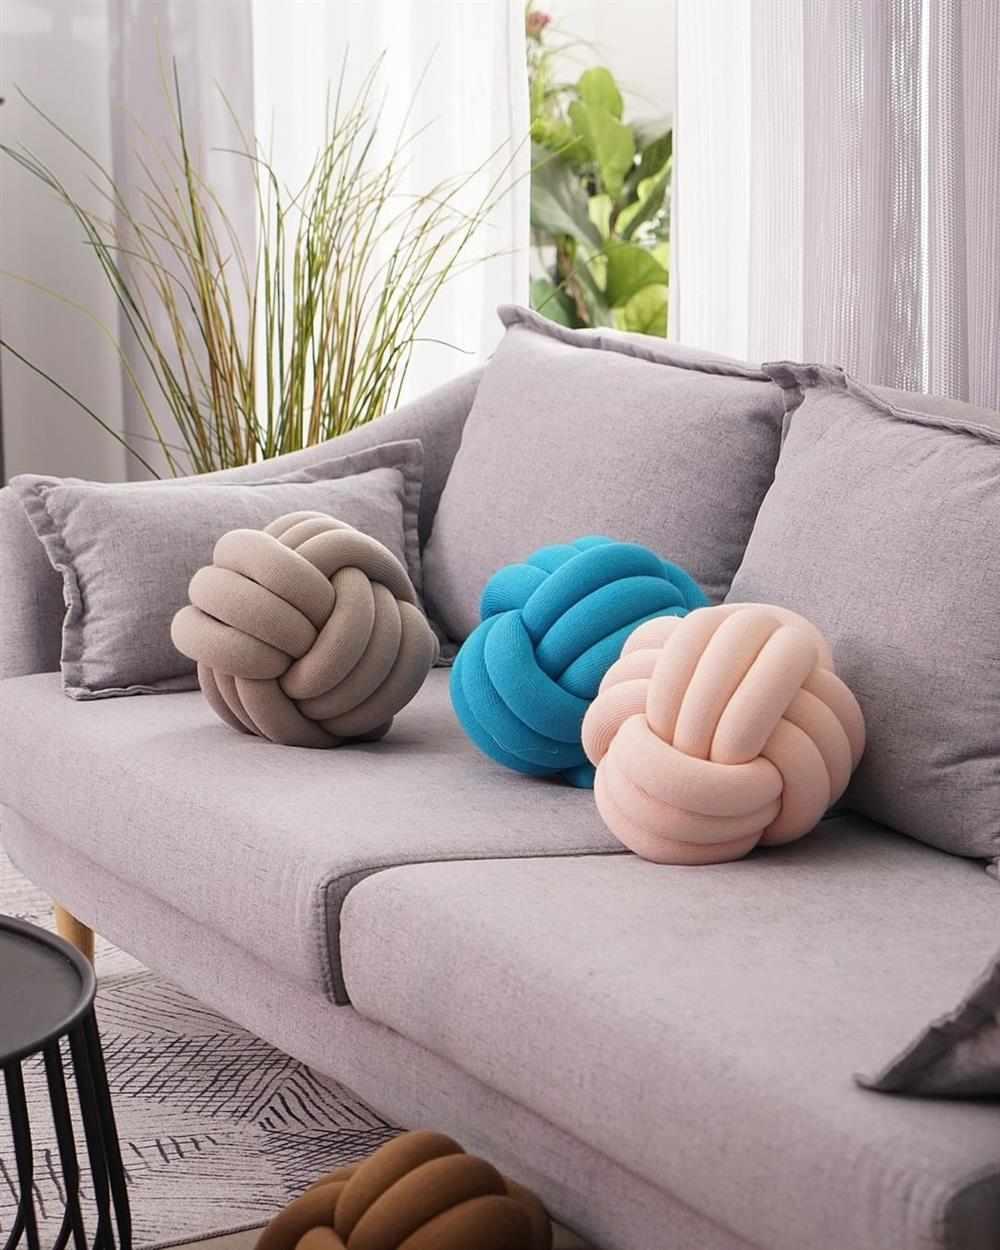 almofada de nó no sofá